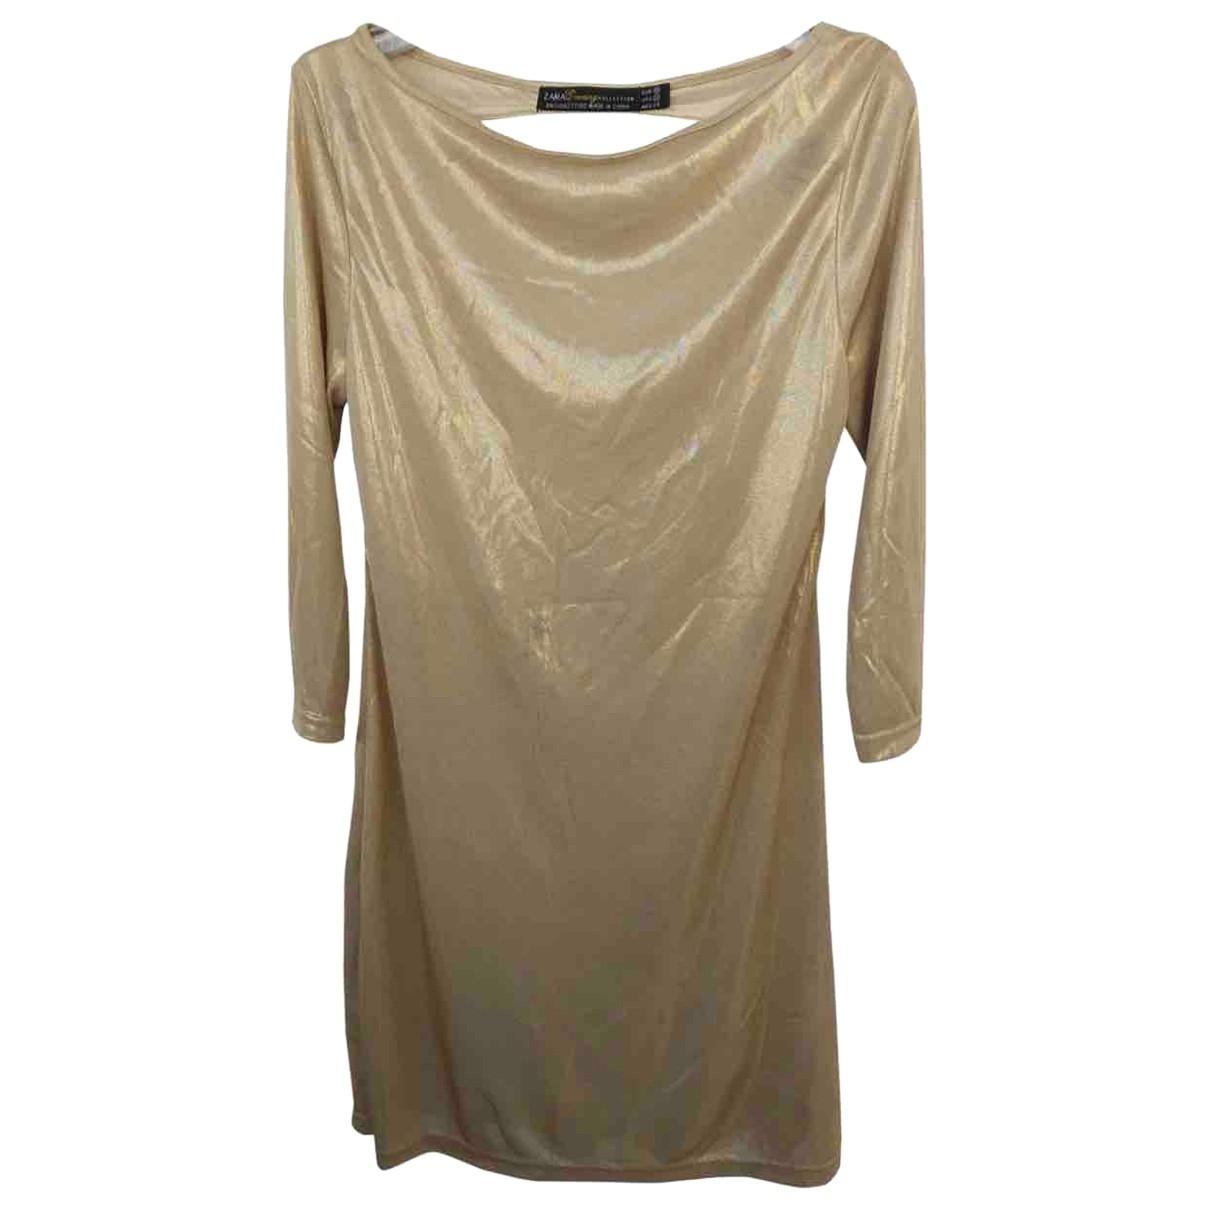 Zara \N Gold dress for Women M International